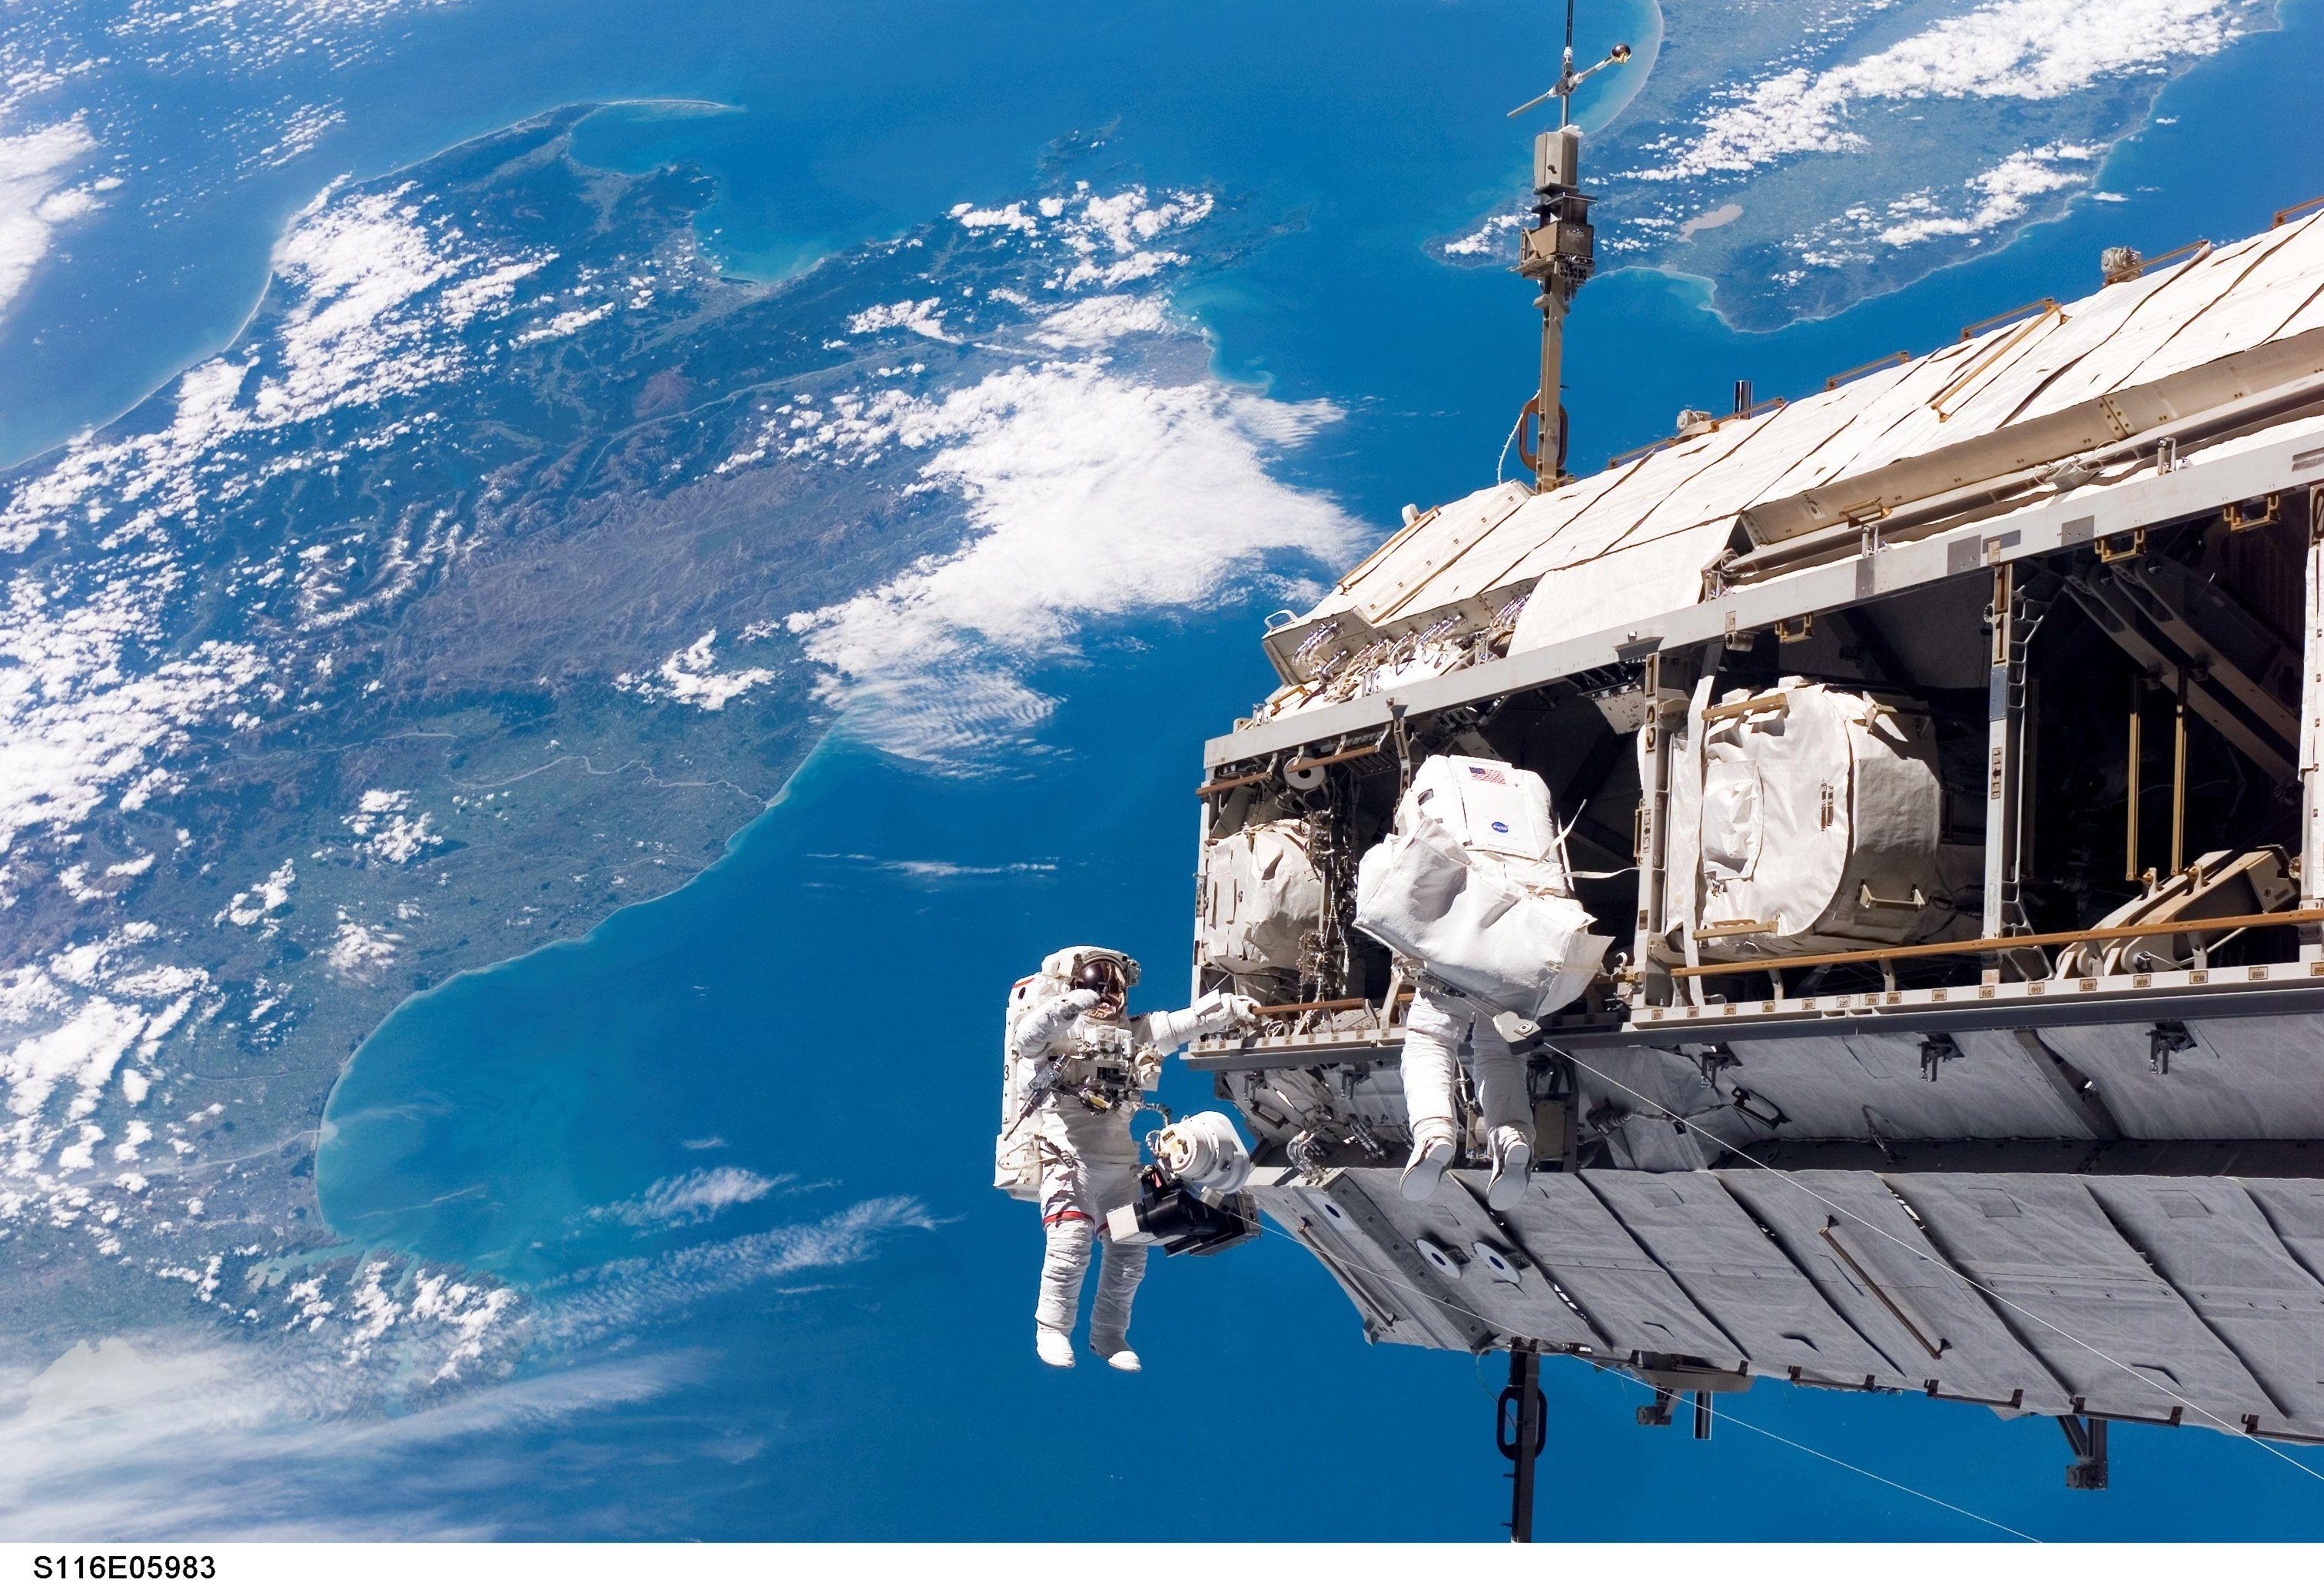 ISS astronauts adjust truss above New Zealand